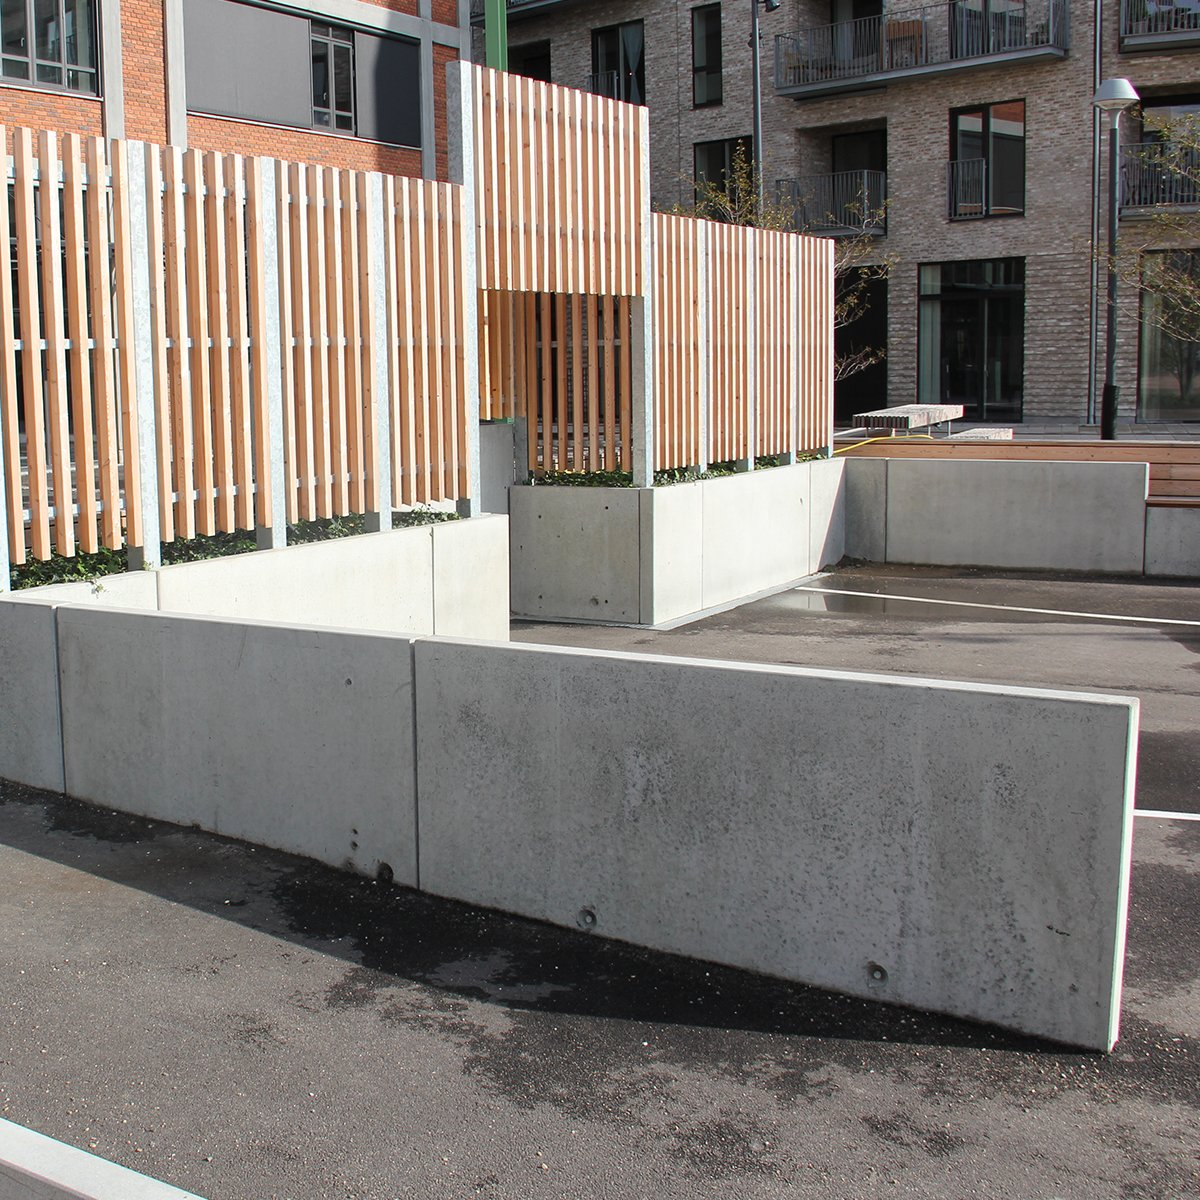 ParkLine Støttemur 40 - 30x200x10 cm Grå